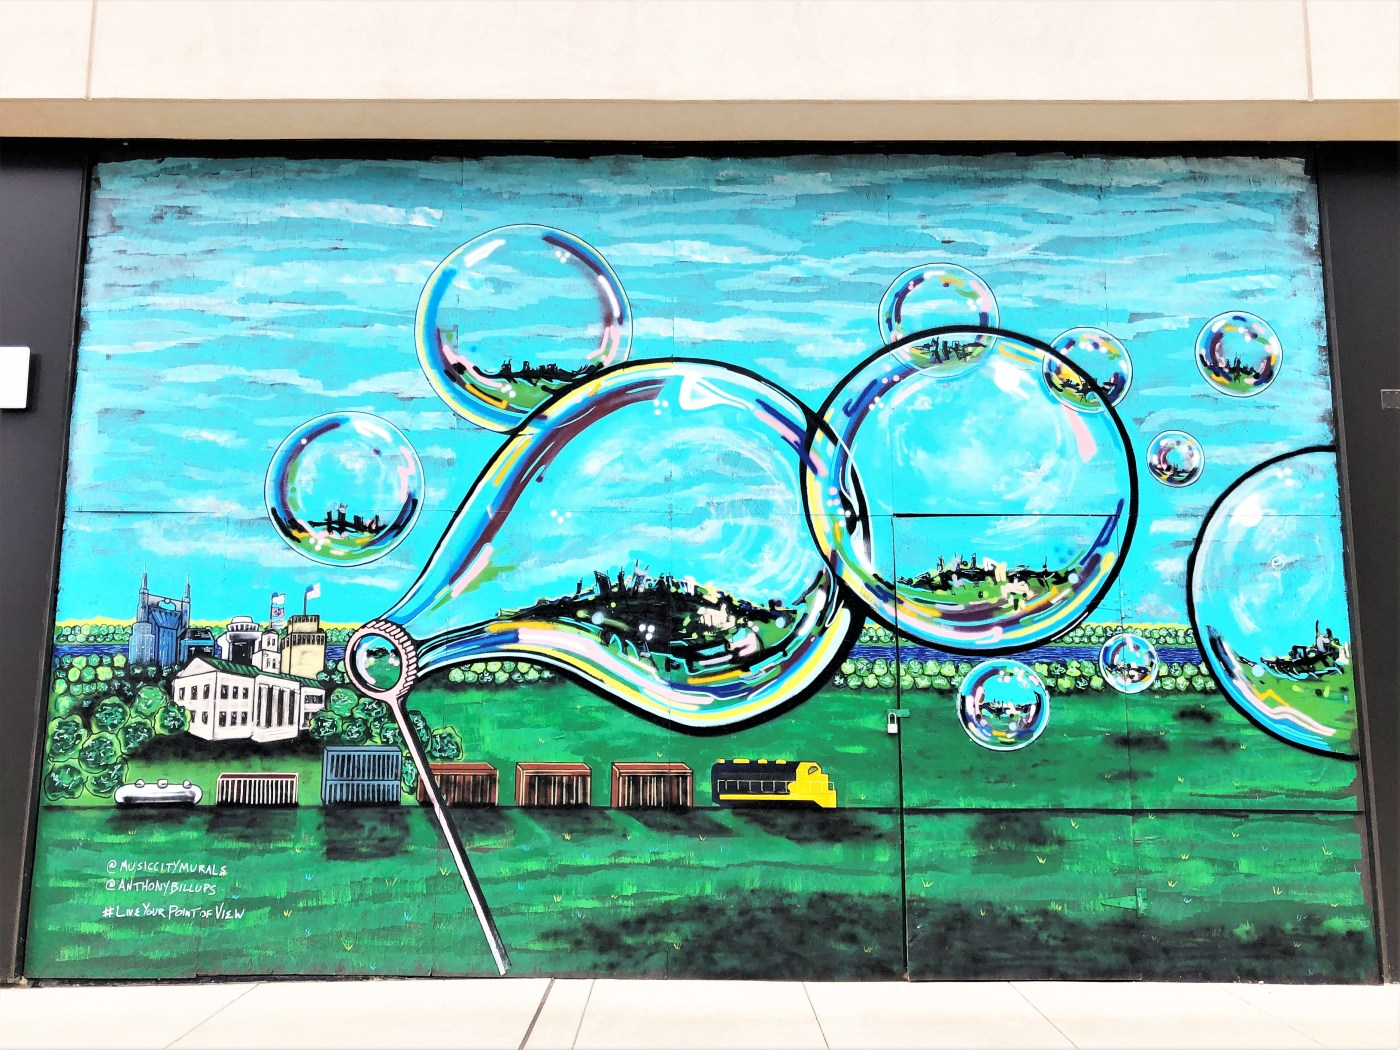 Bubbles mural Nashville street art